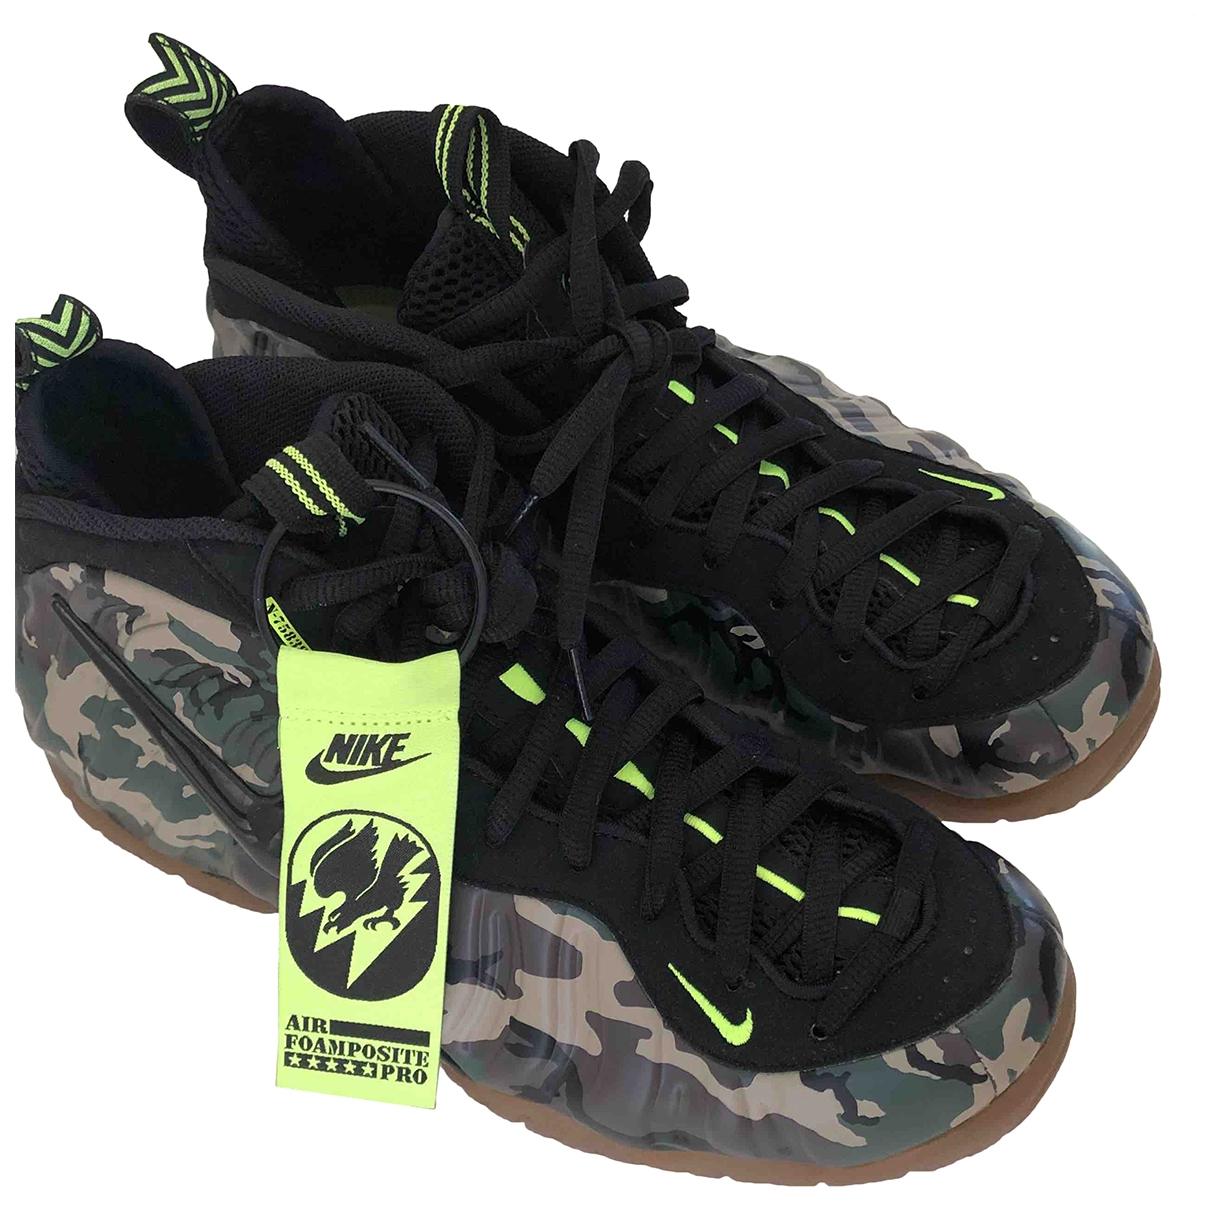 Nike - Baskets Air Foamposite pour homme en toile - kaki